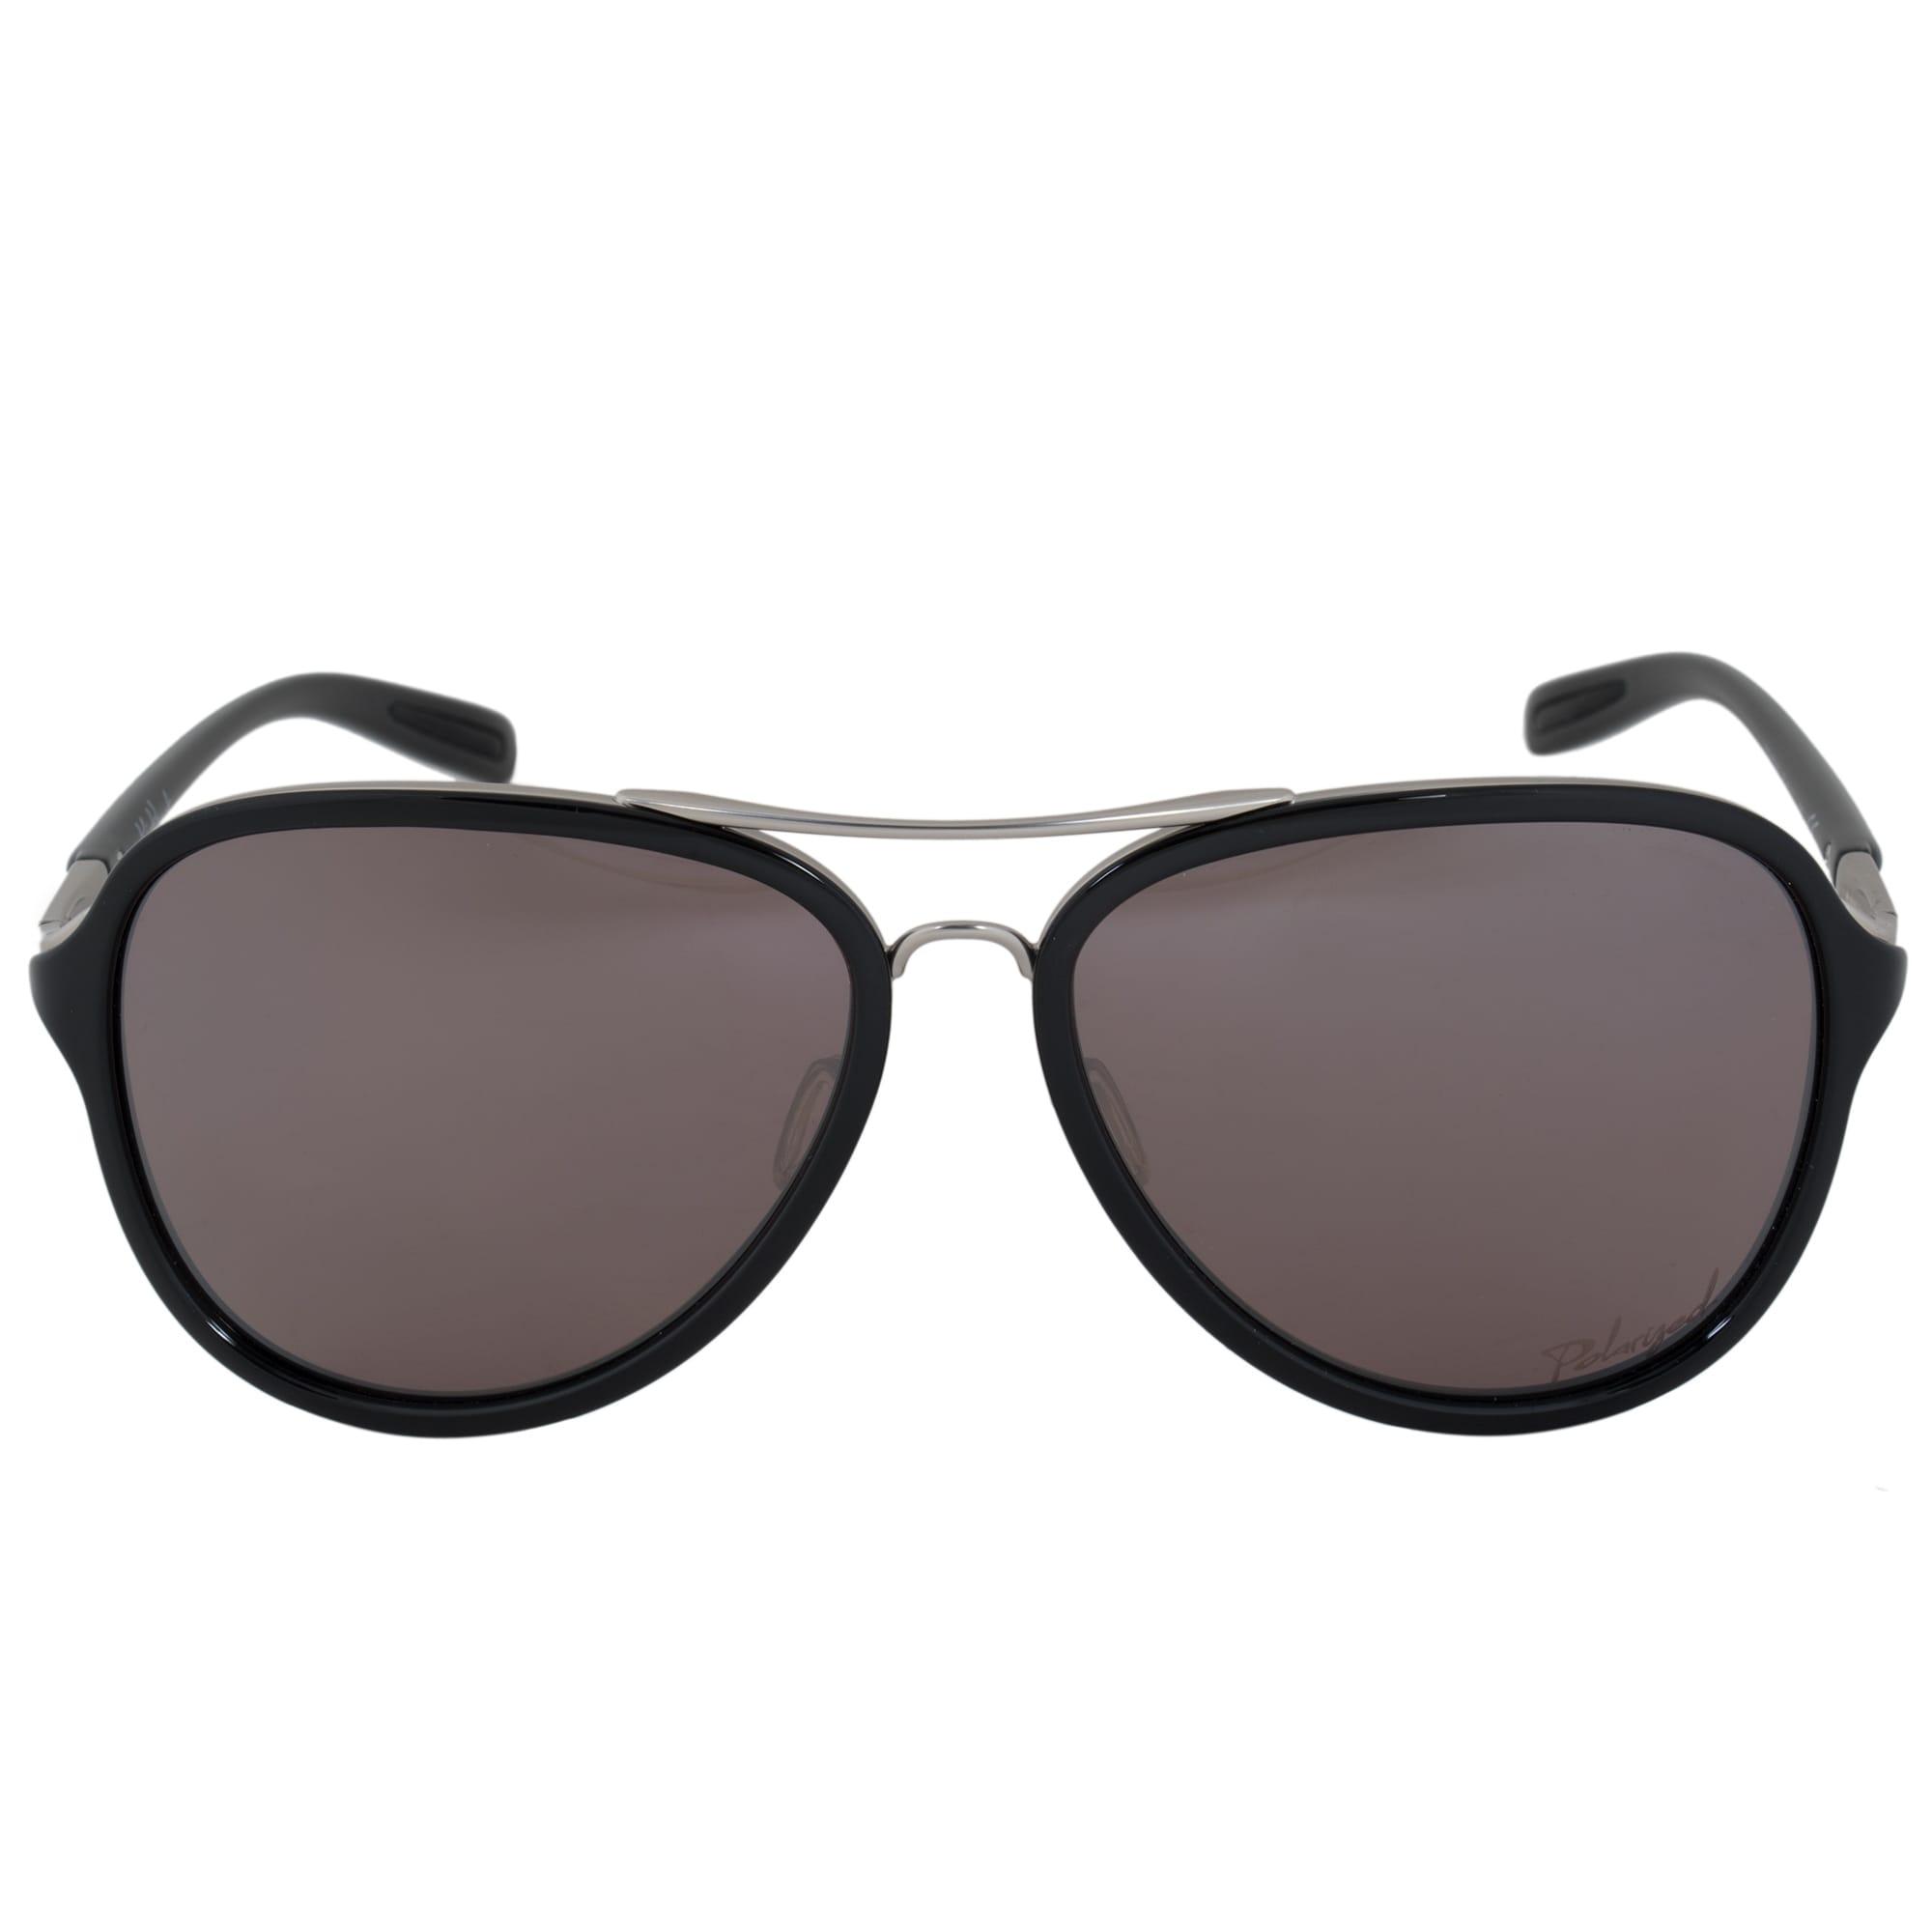 eb83af06213 Oakley Kickback Pilot Sunglasses 0OO4102 410206 58